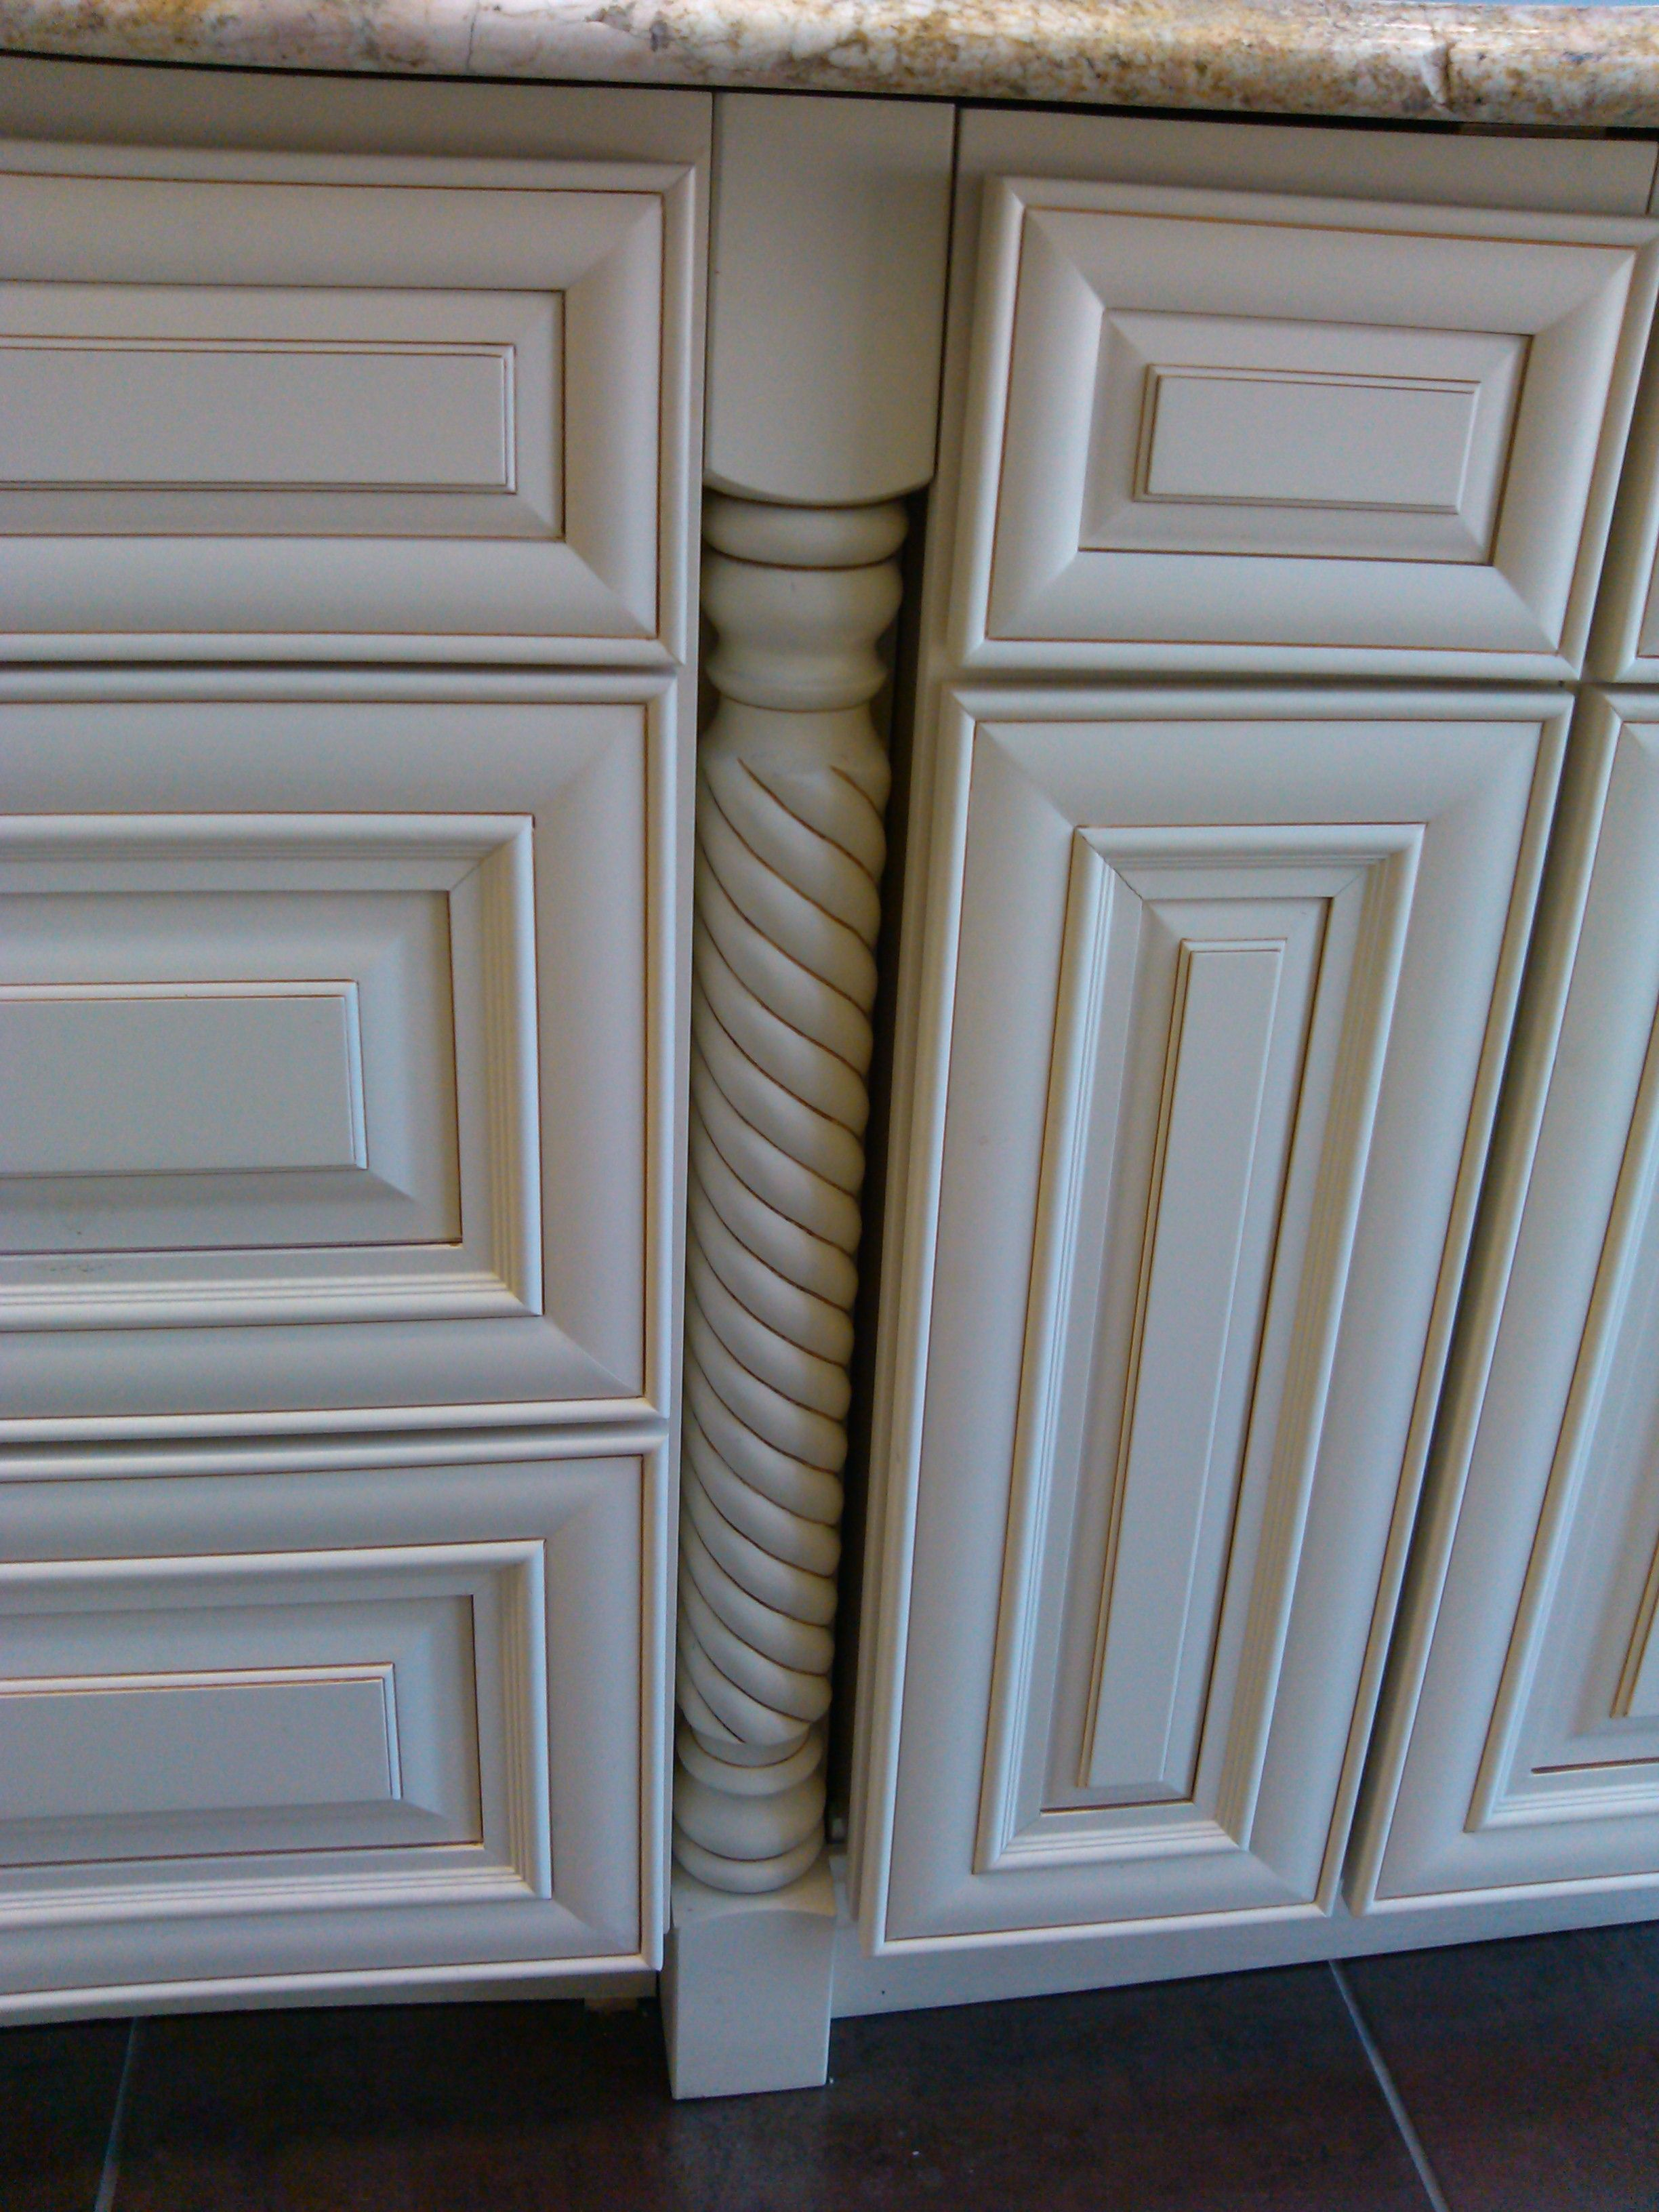 Cream Maple Glaze Rta Cabinets From Cabinetsdirectrta Com Rta